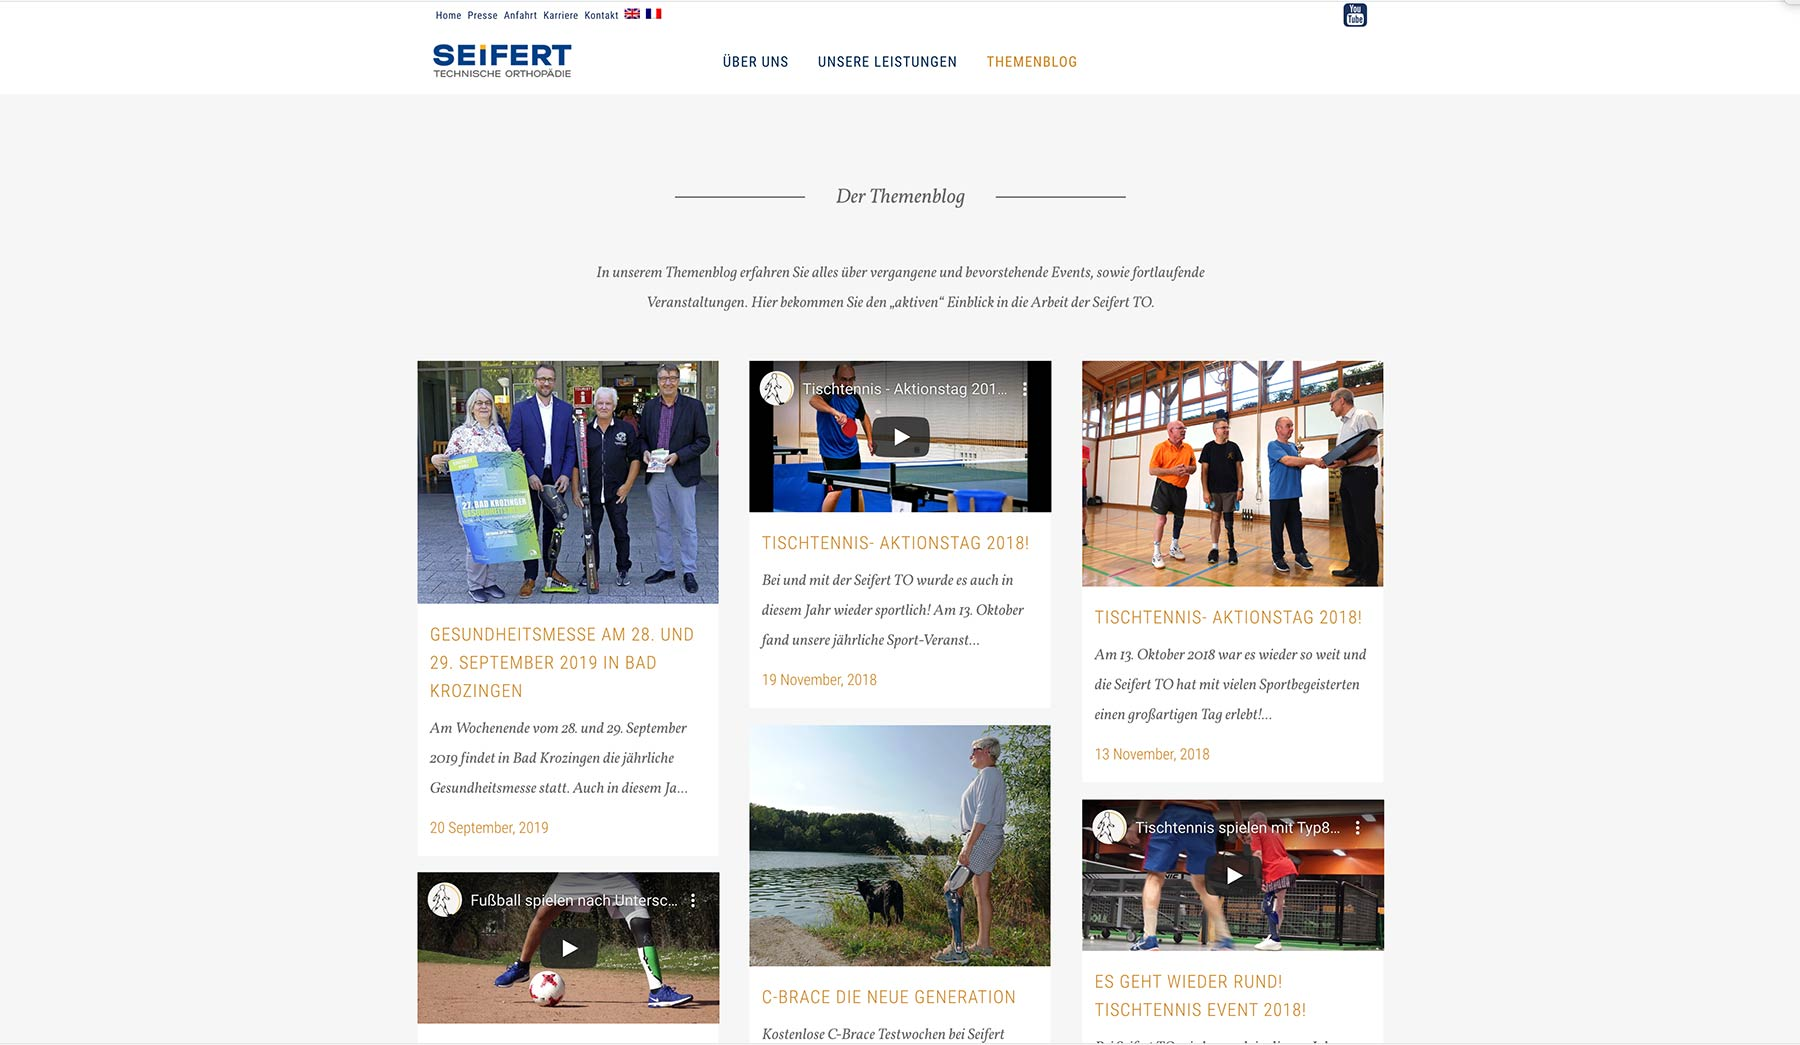 Seifert Screendesign WordPress Themenblog Design